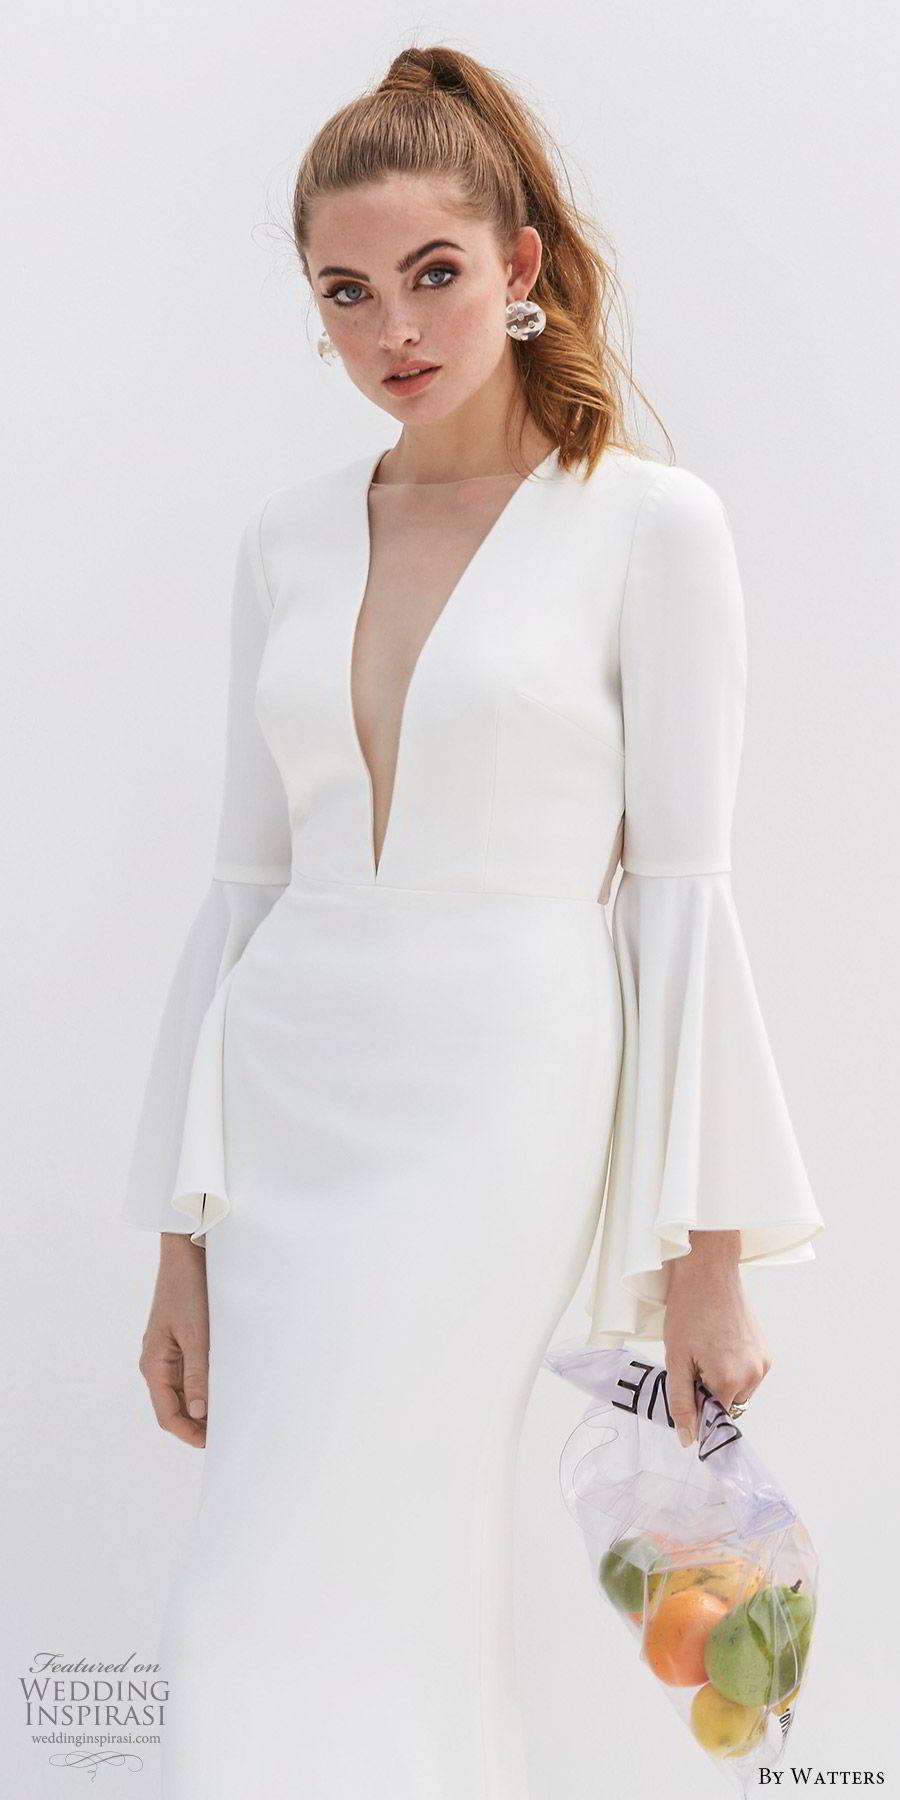 by watters 2020 bridal long bell sleeves deep v neckline sheer side open back minimally embellished sheath wedding dress (7) clean modern chic zv